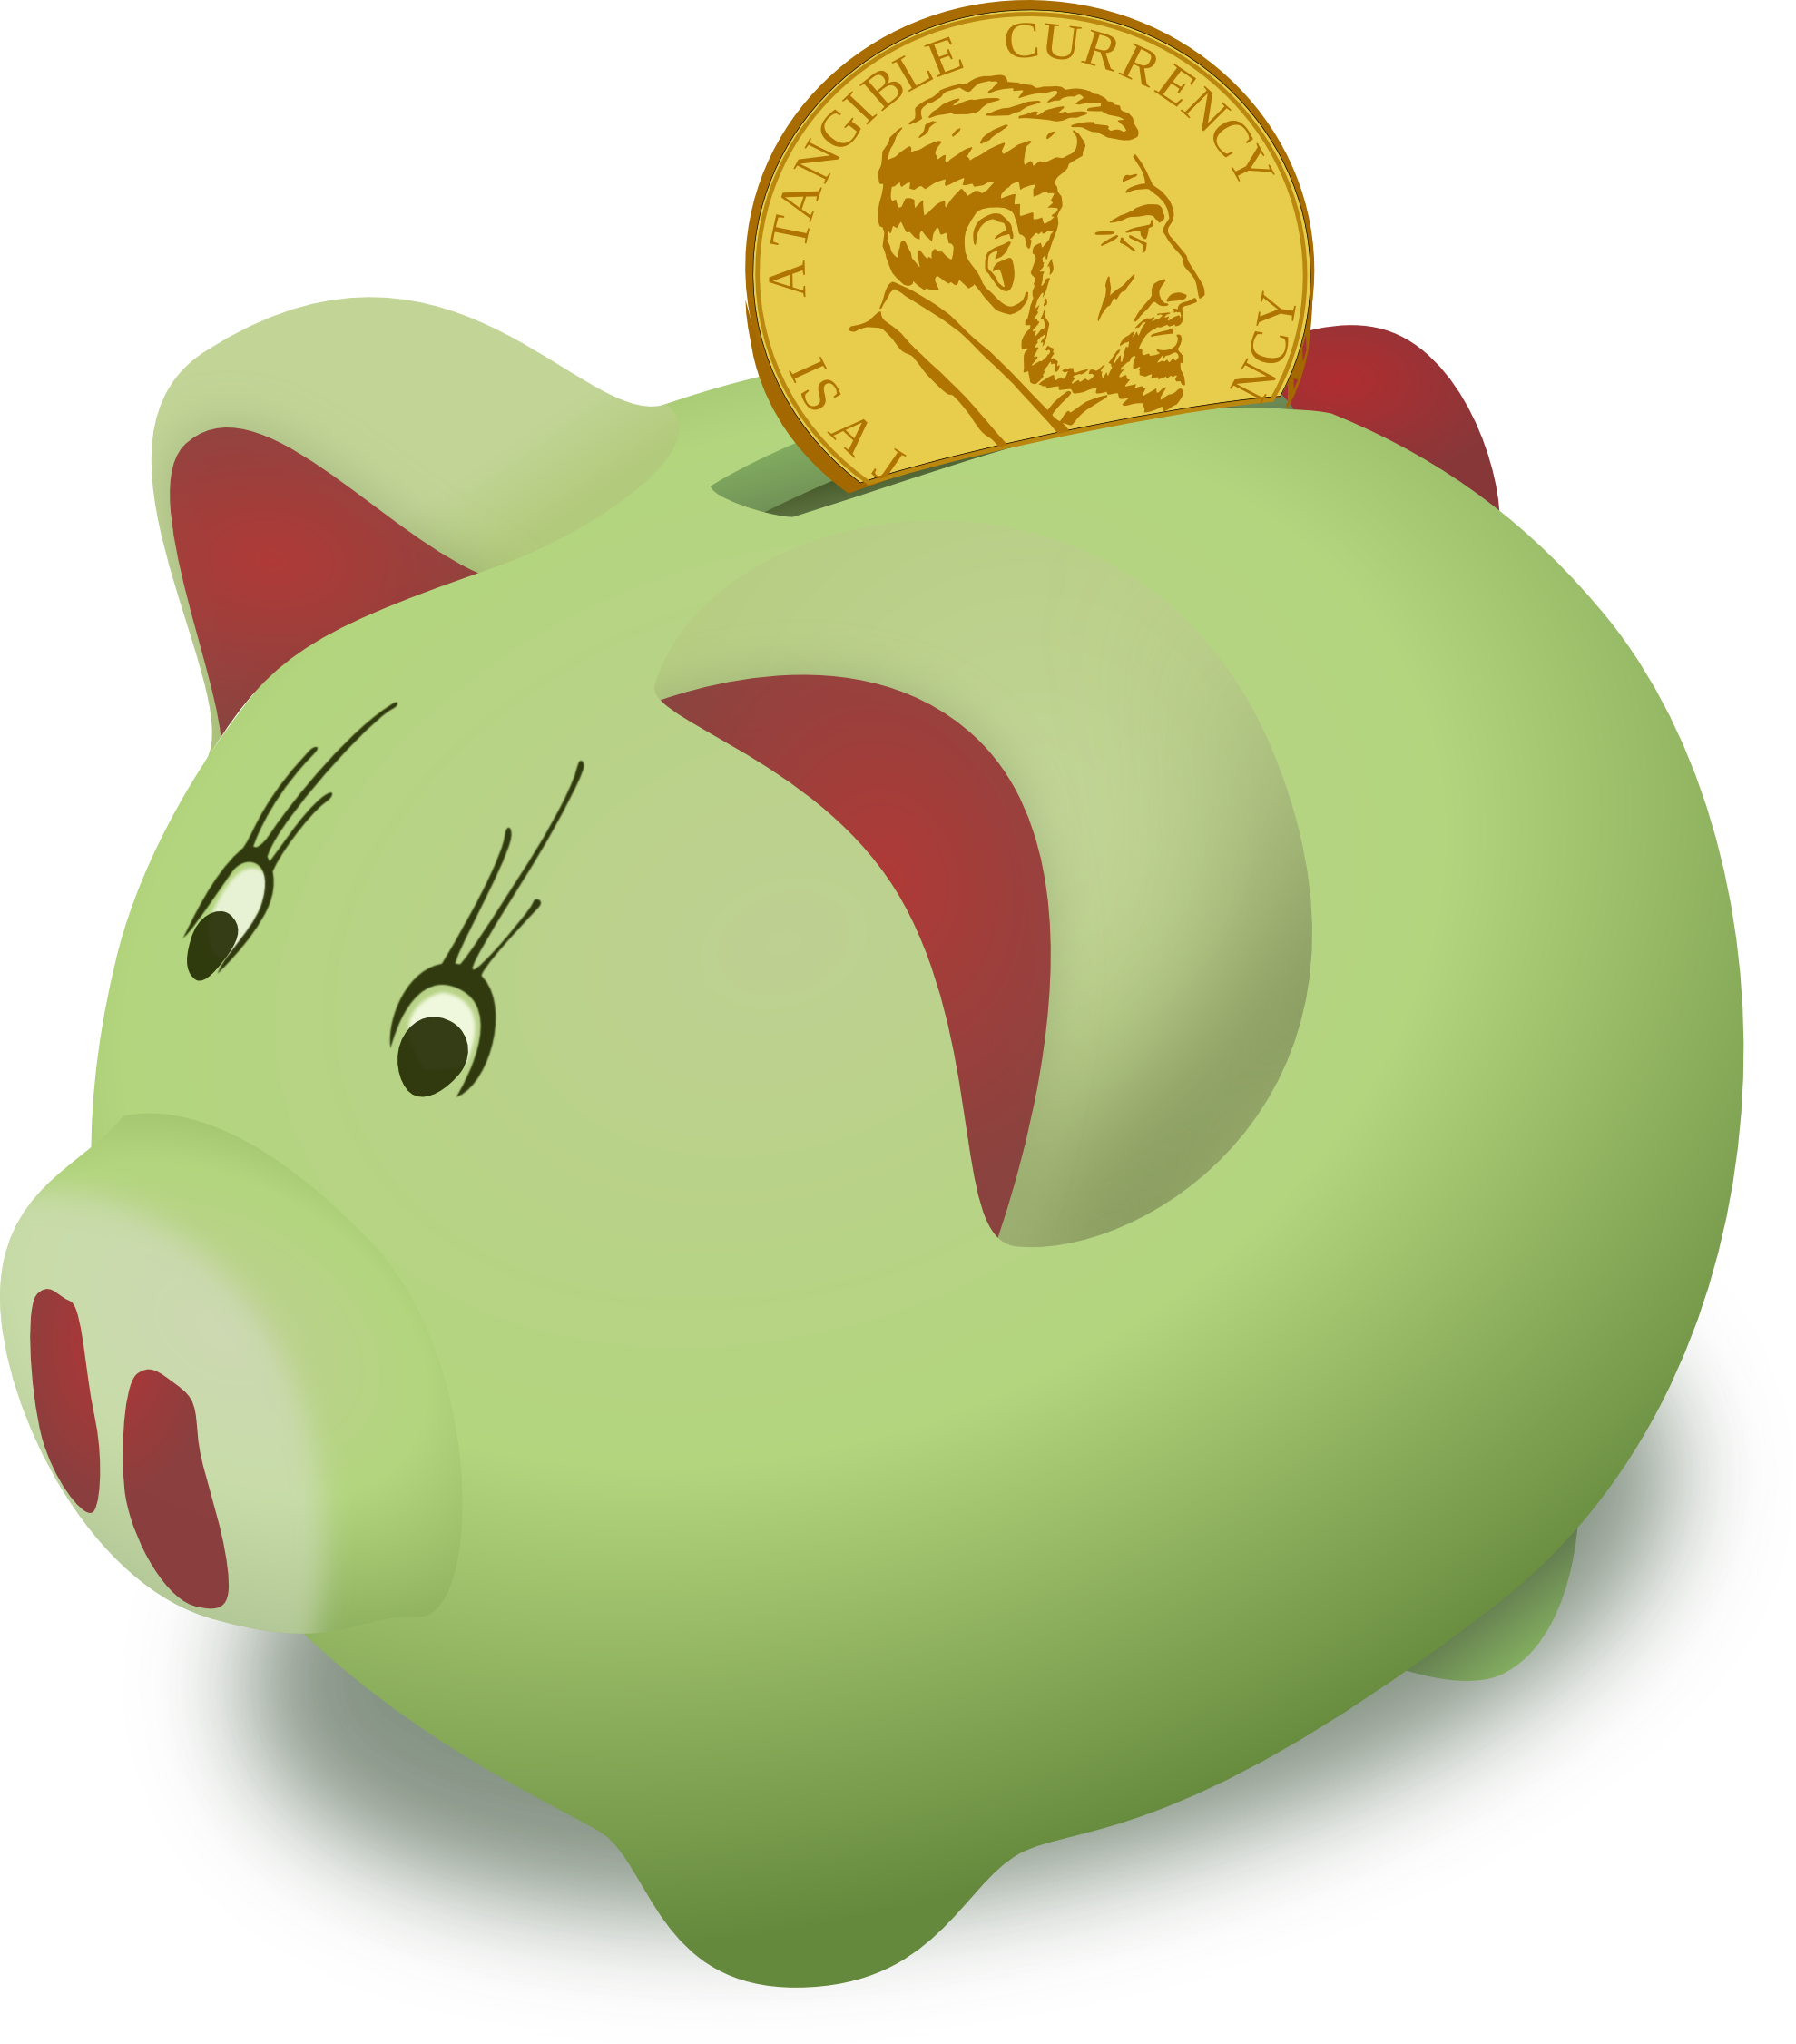 Clip art . Bank clipart savings bank